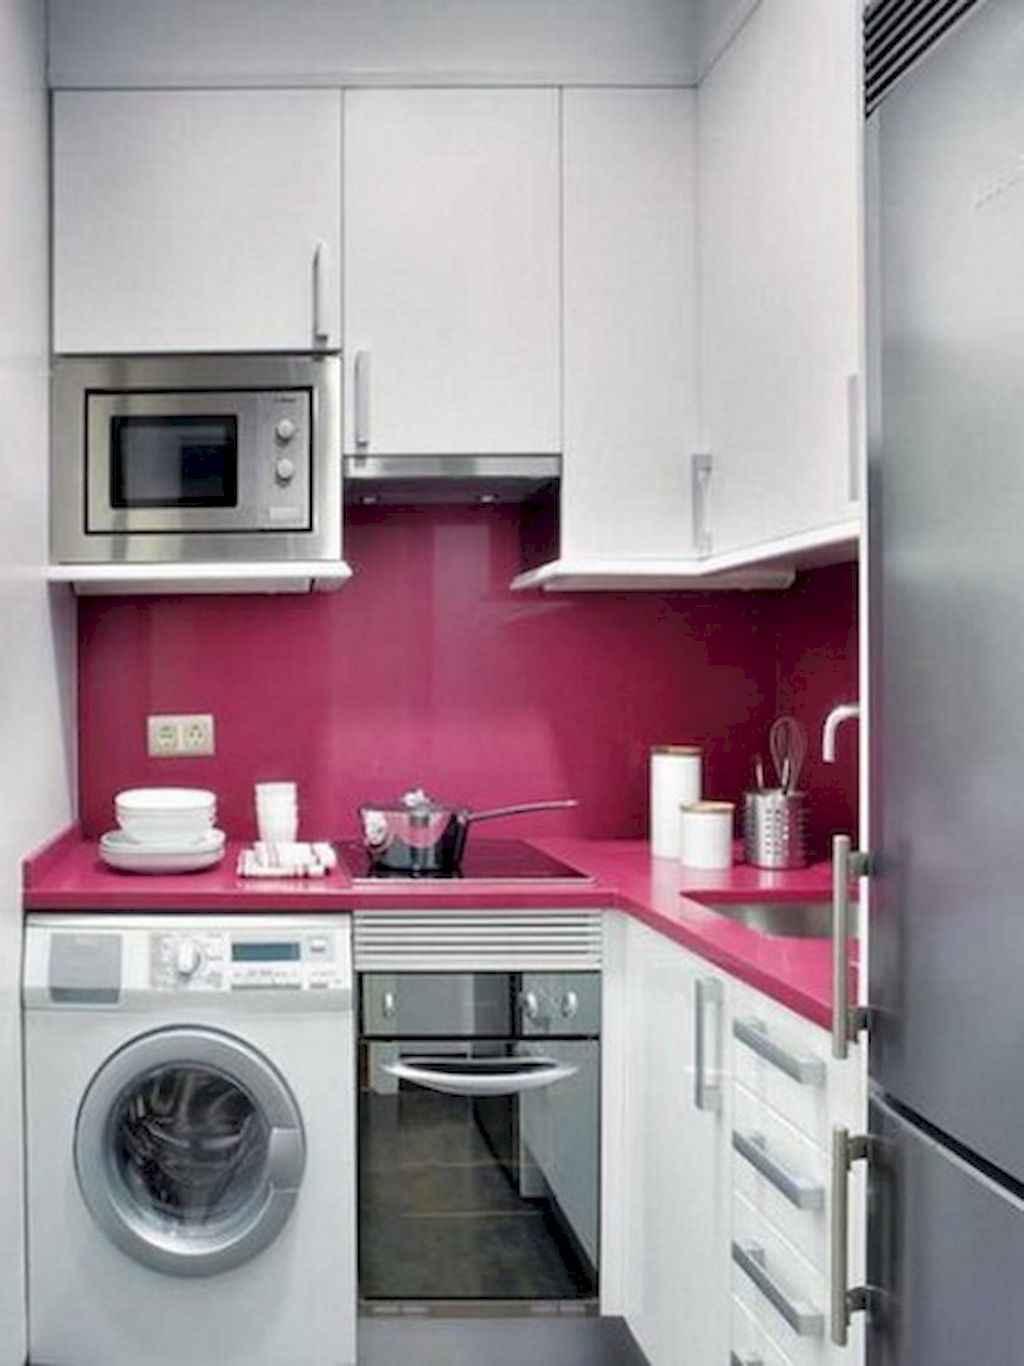 Small Apartment Balcony Garden Ideas: 50 Amazing Small Apartment Kitchen Decor Ideas (43